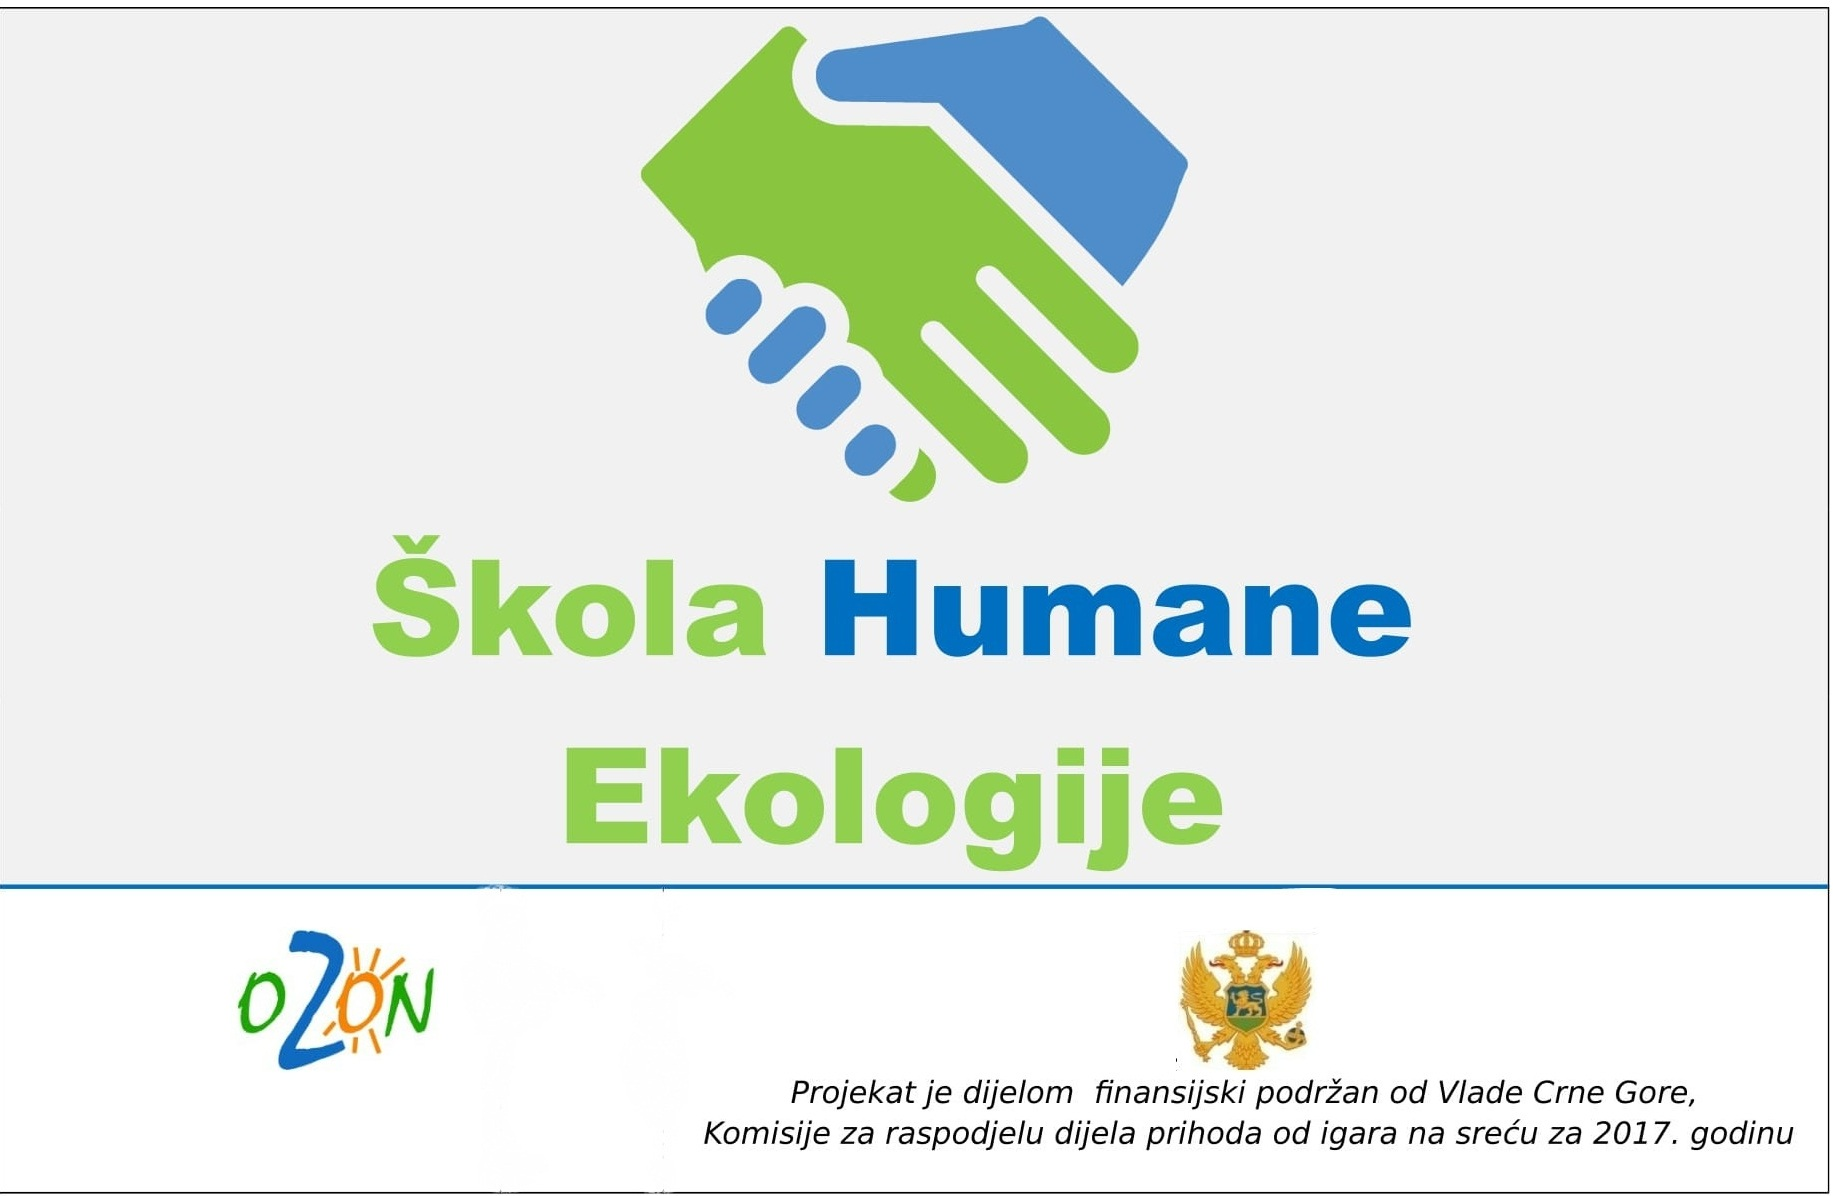 Skola Humane Ekologije